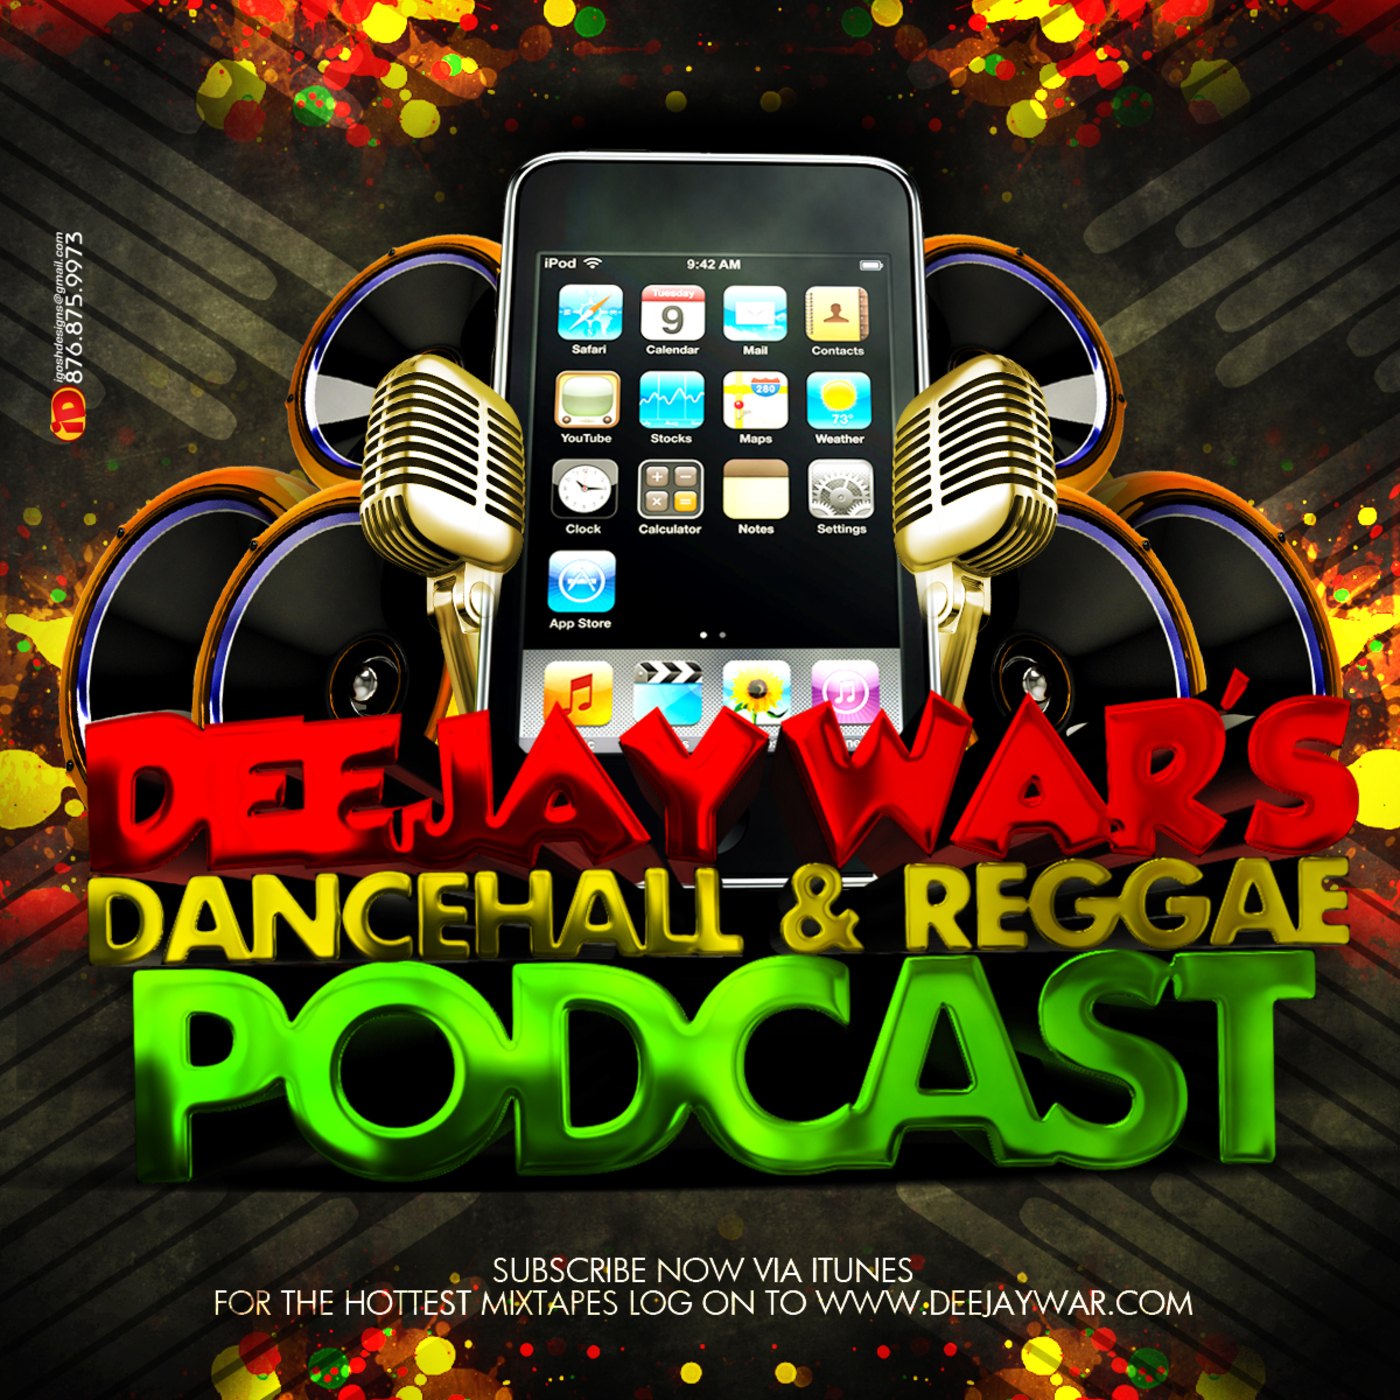 DJ War's Dancehall & Reggae Podcast